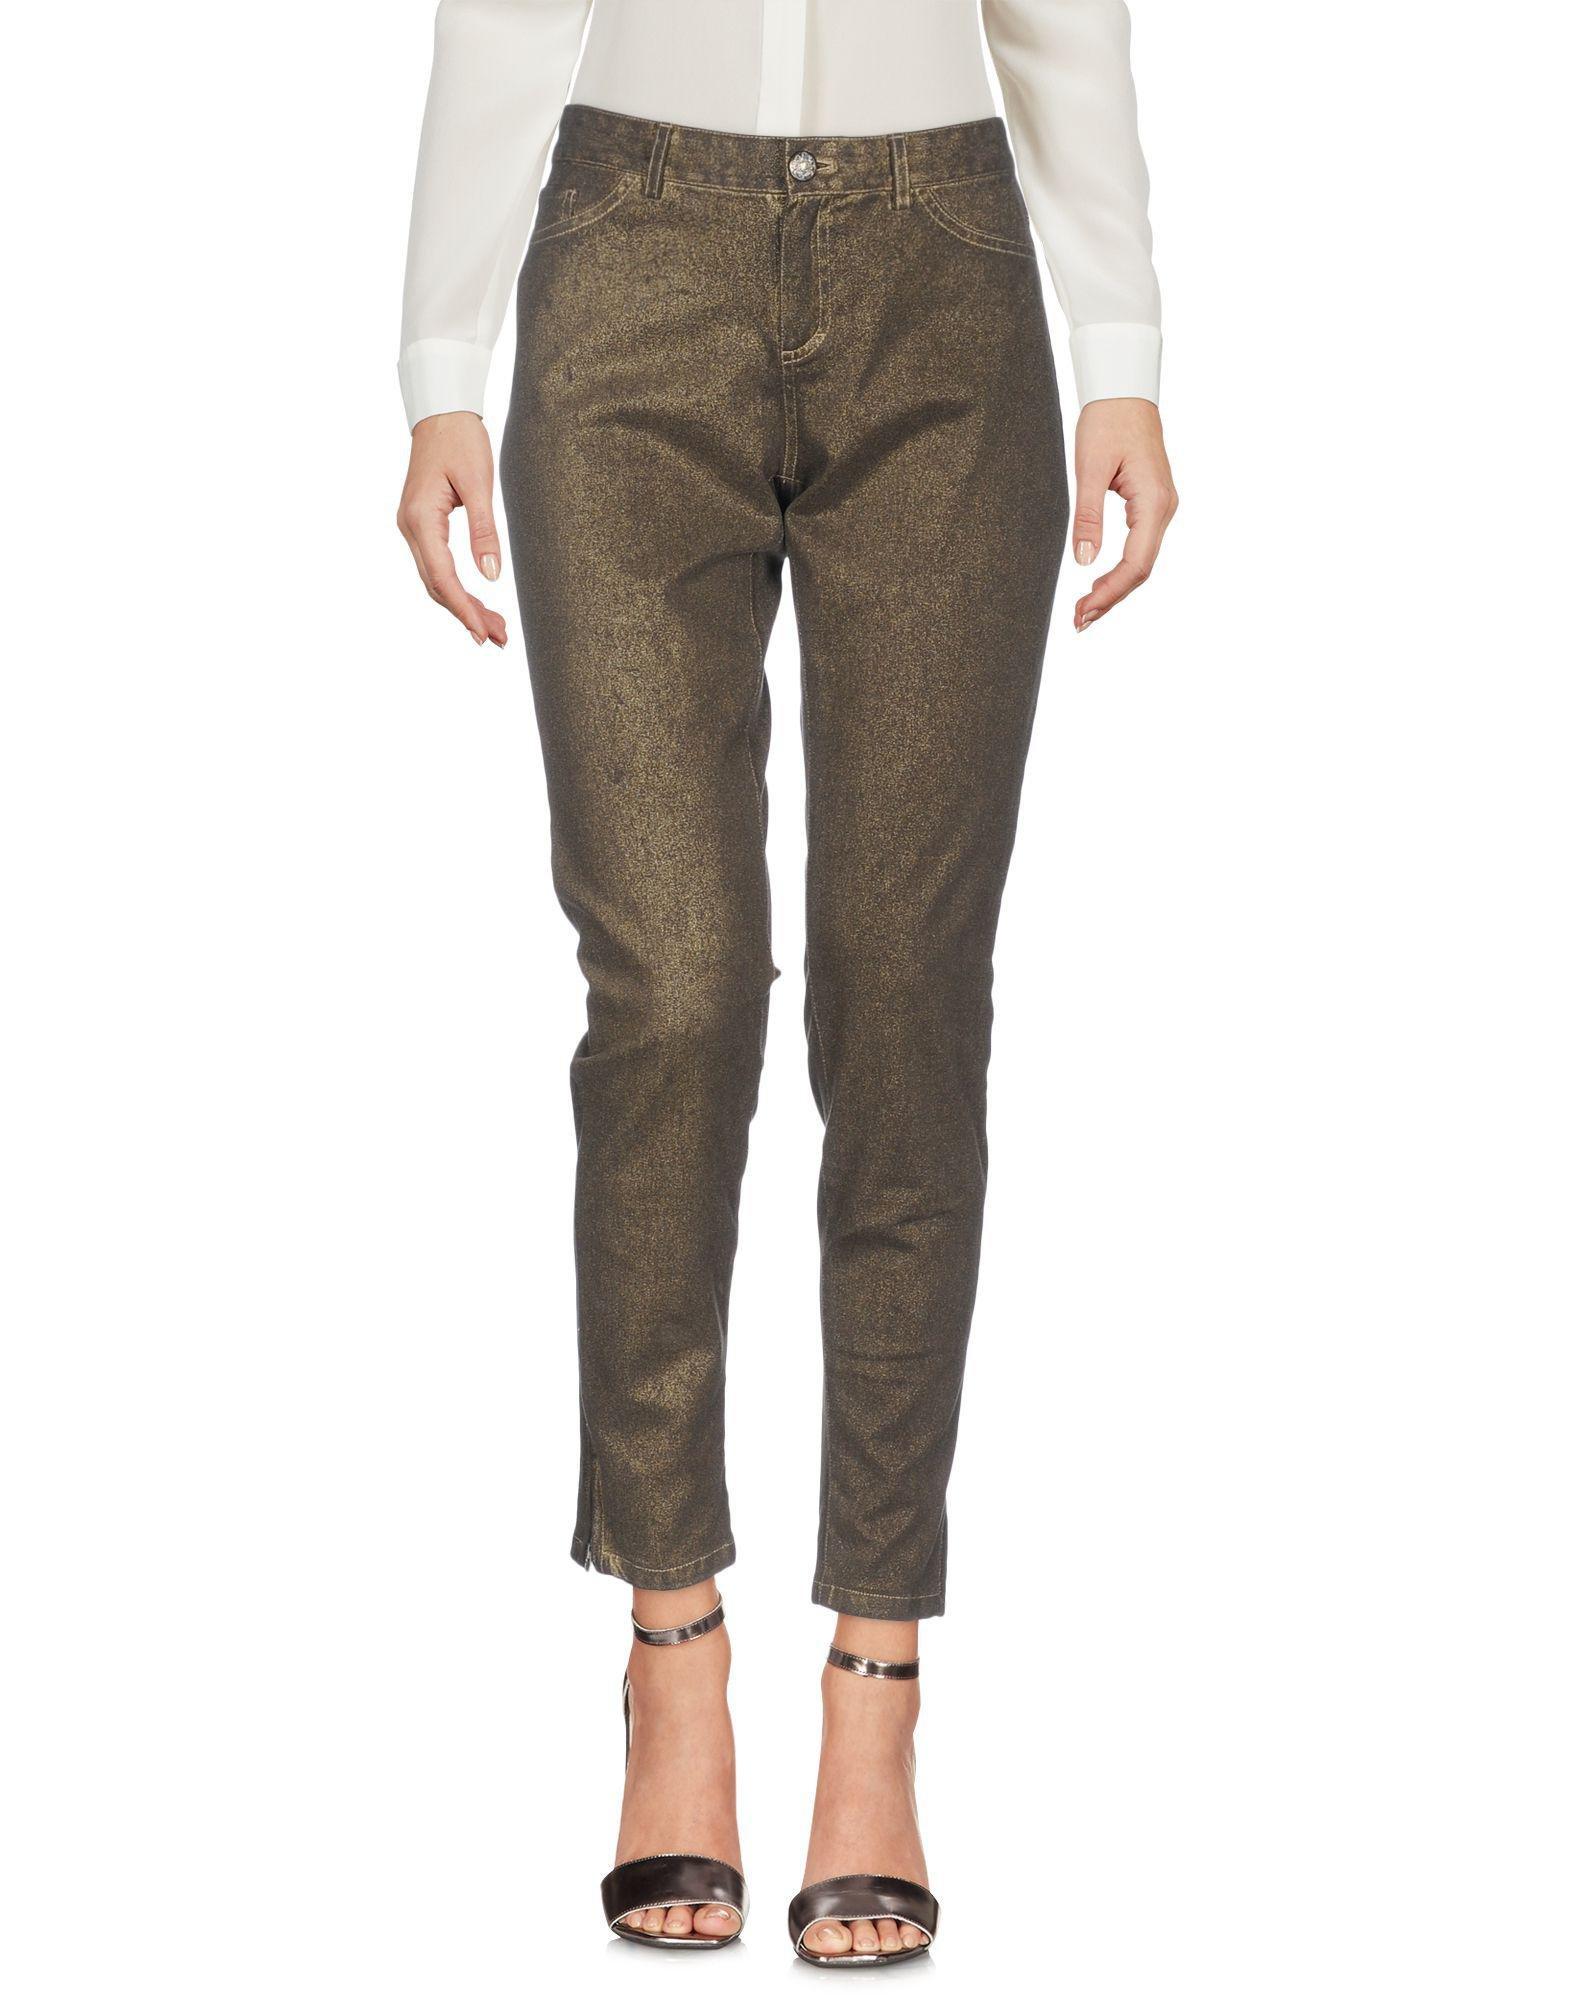 Pantalon - Pantalon Décontracté 0039 Italie 5nGPO3RSl